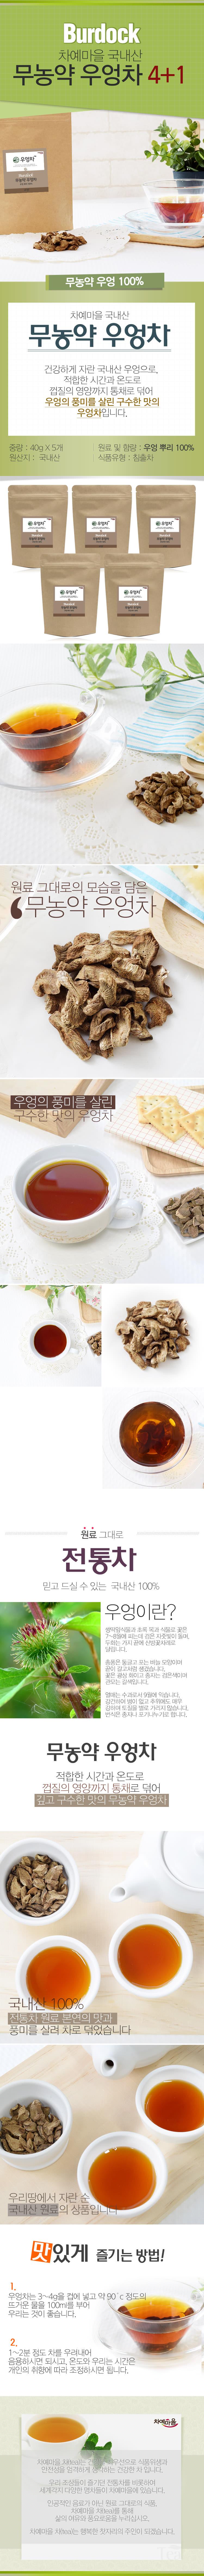 [ AndongMabuyongAriculture ] [Chayemaul/茶艺村] 韩国产 无农药 牛蒡茶 40g 4+1ea